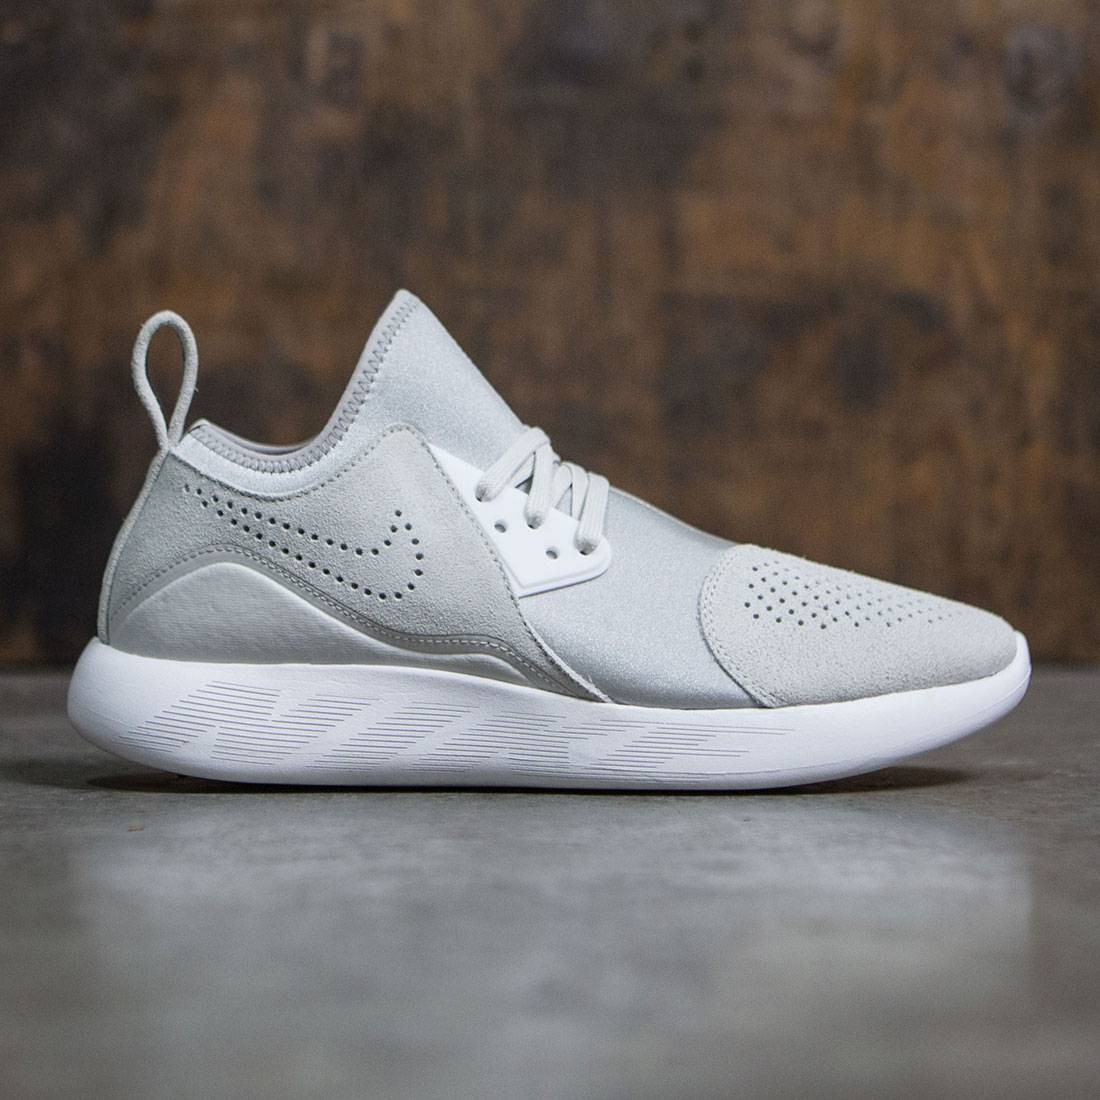 new style 7048f a24ea Nike Men Lunarcharge Premium (light bone   summit white-pale grey-volt)